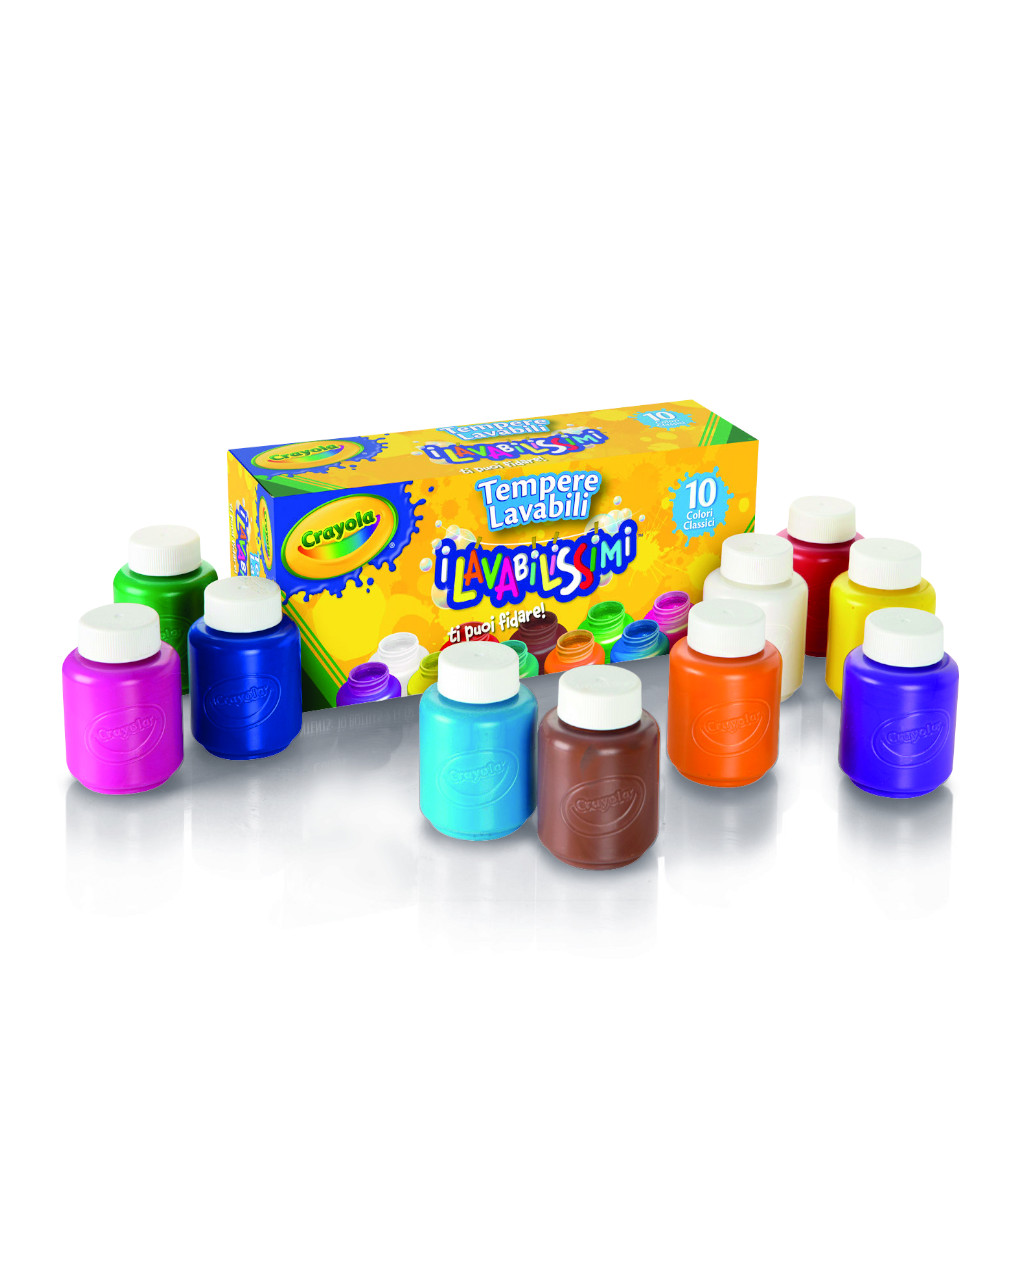 Crayola - 10 tempere lavabili - Crayola